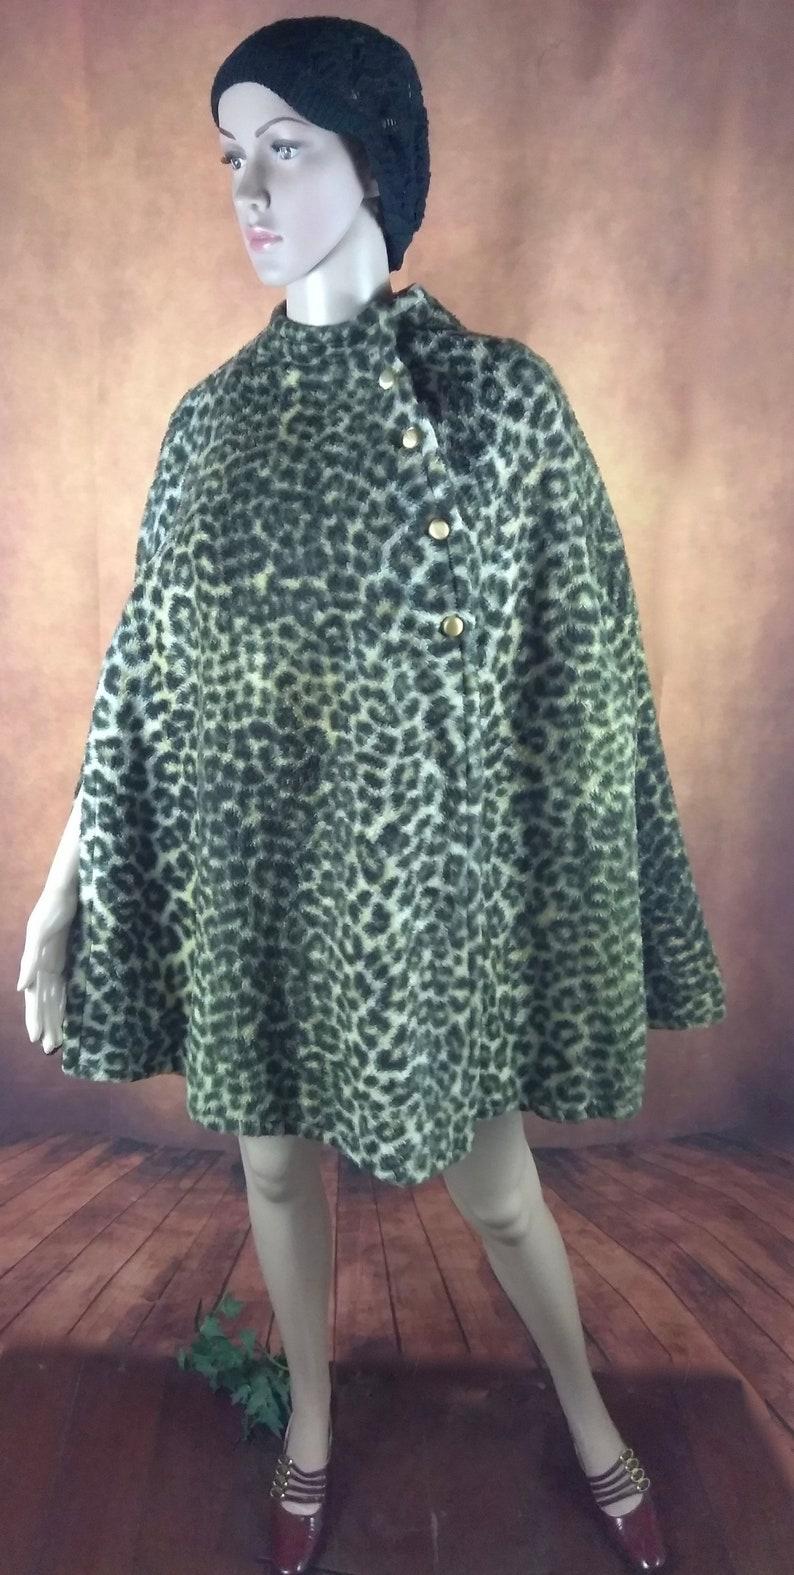 Vintage Leopard PonchoShort Faux Animal Print CapeHandmade Mod CloakGold Tone Button ClosureTwiggy Style